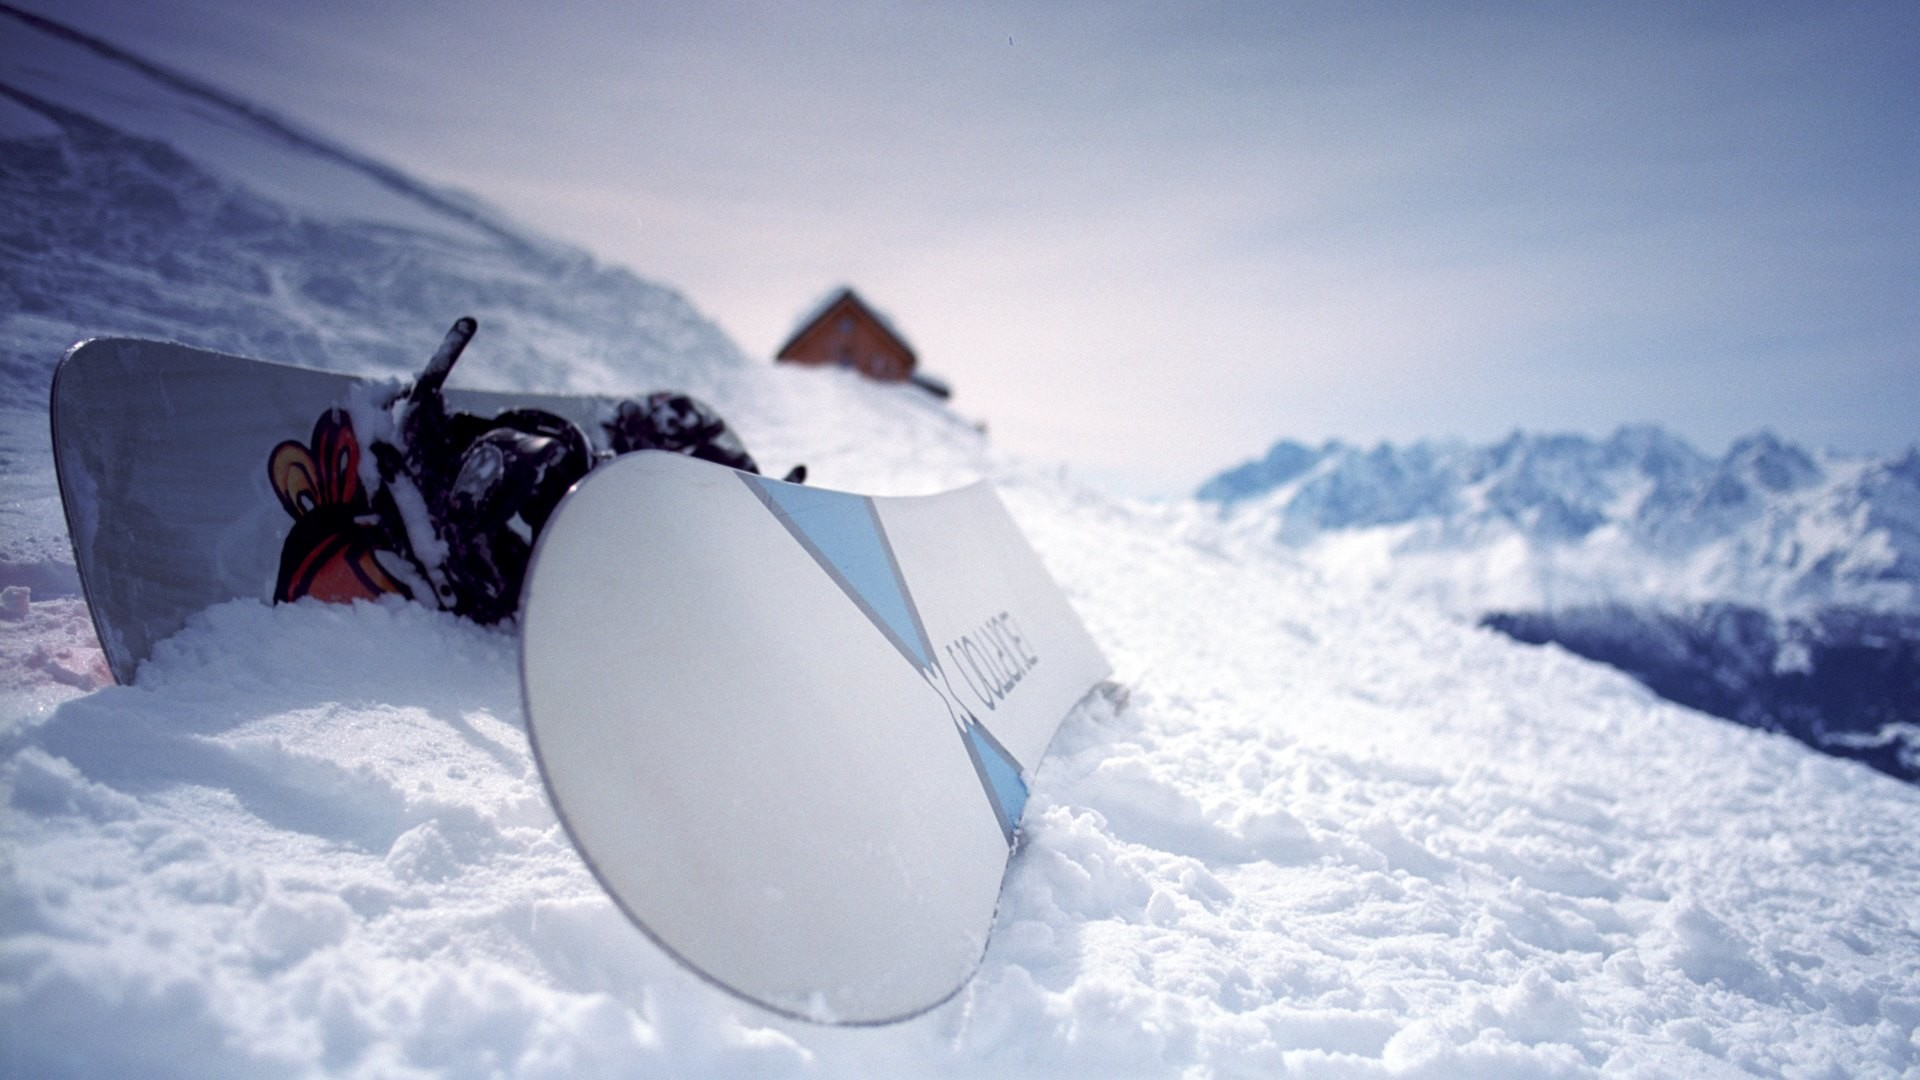 Картинки по запросу snowboard wallpapers hd